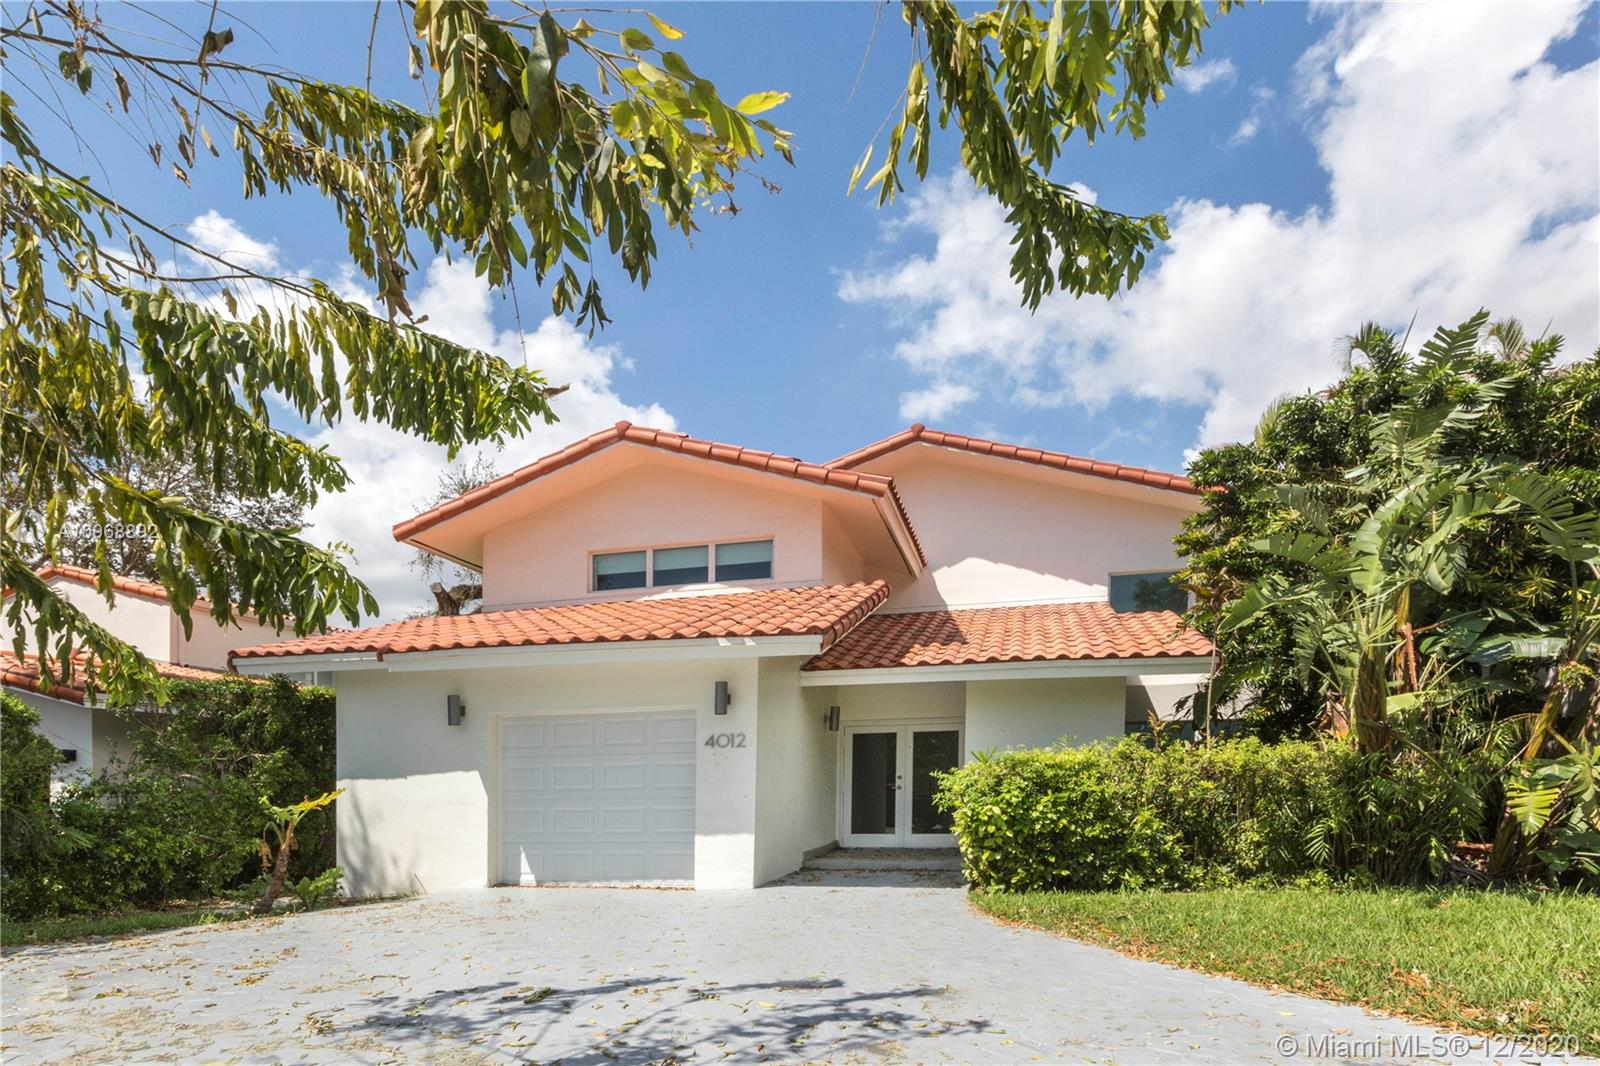 South Miami - 4012 Alhambra Cir, Coral Gables, FL 33146